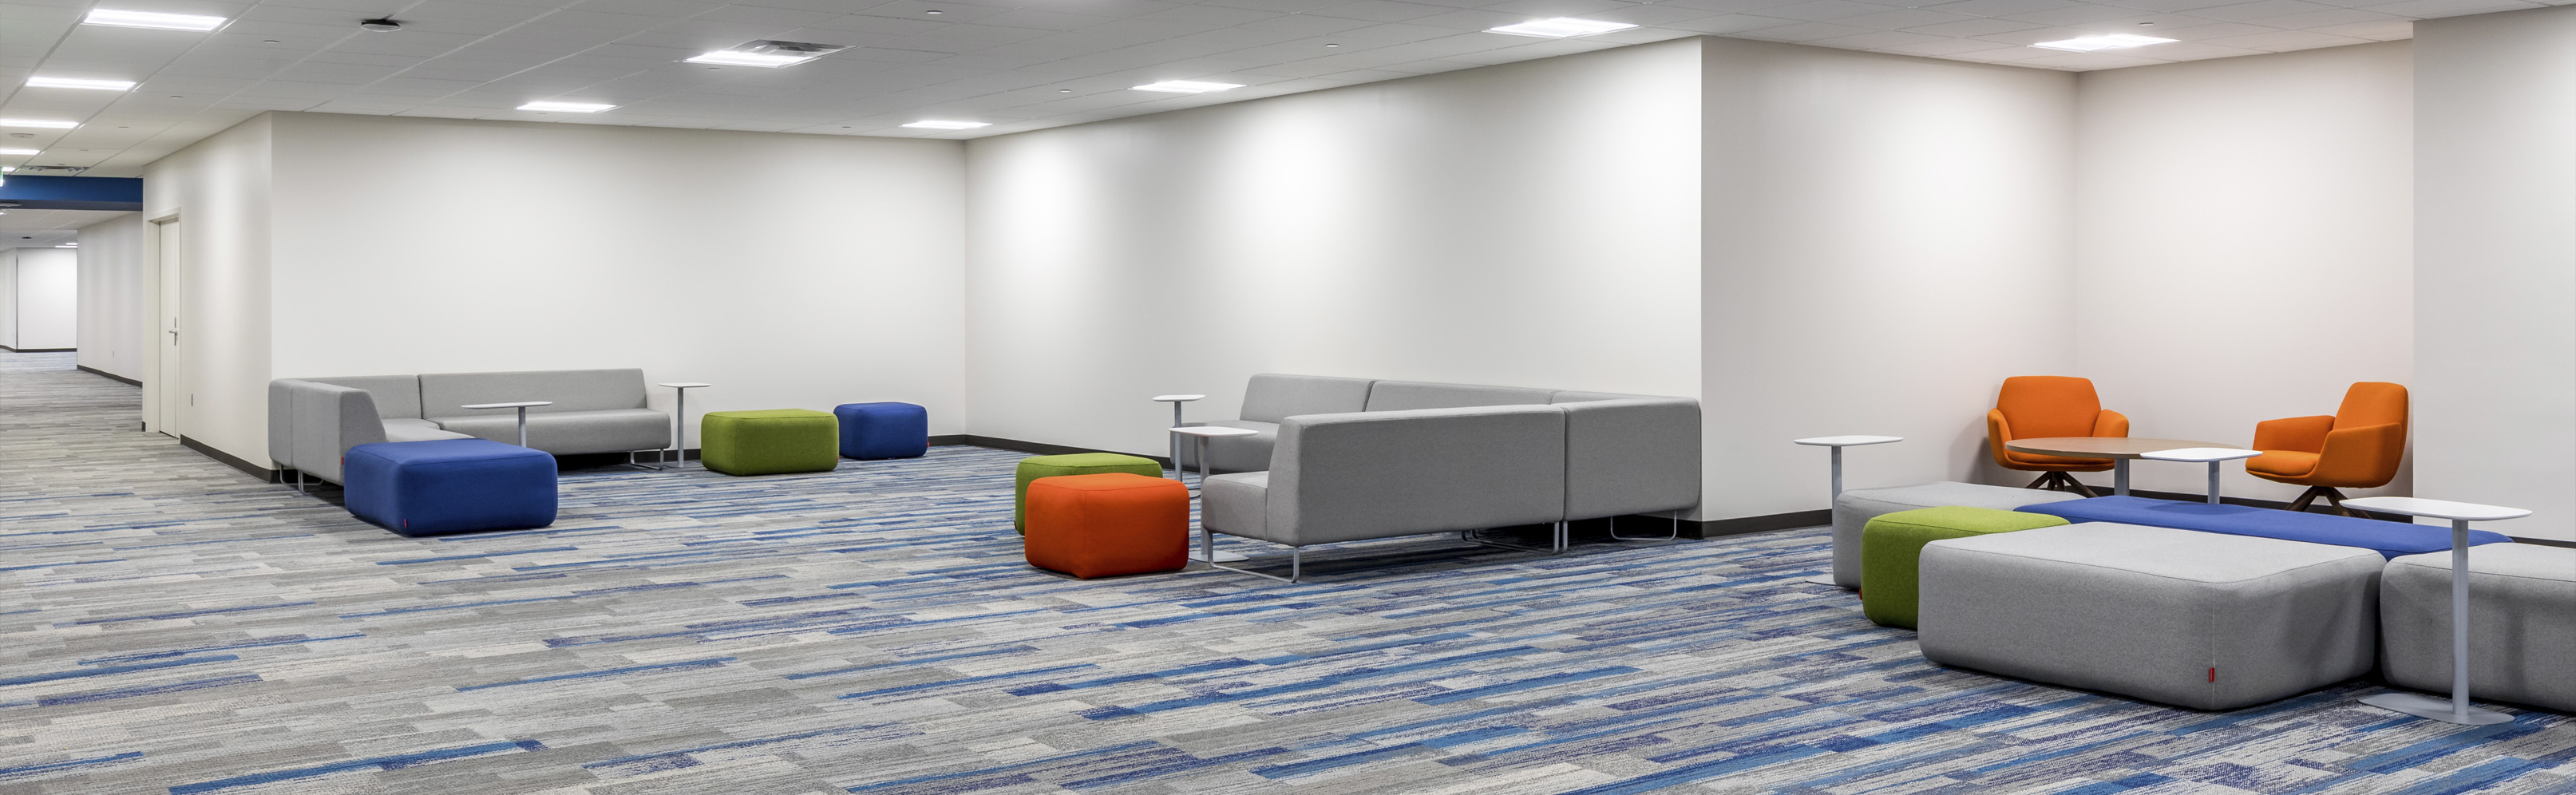 Cerner Office Building - Kelly Construction Group Kansas